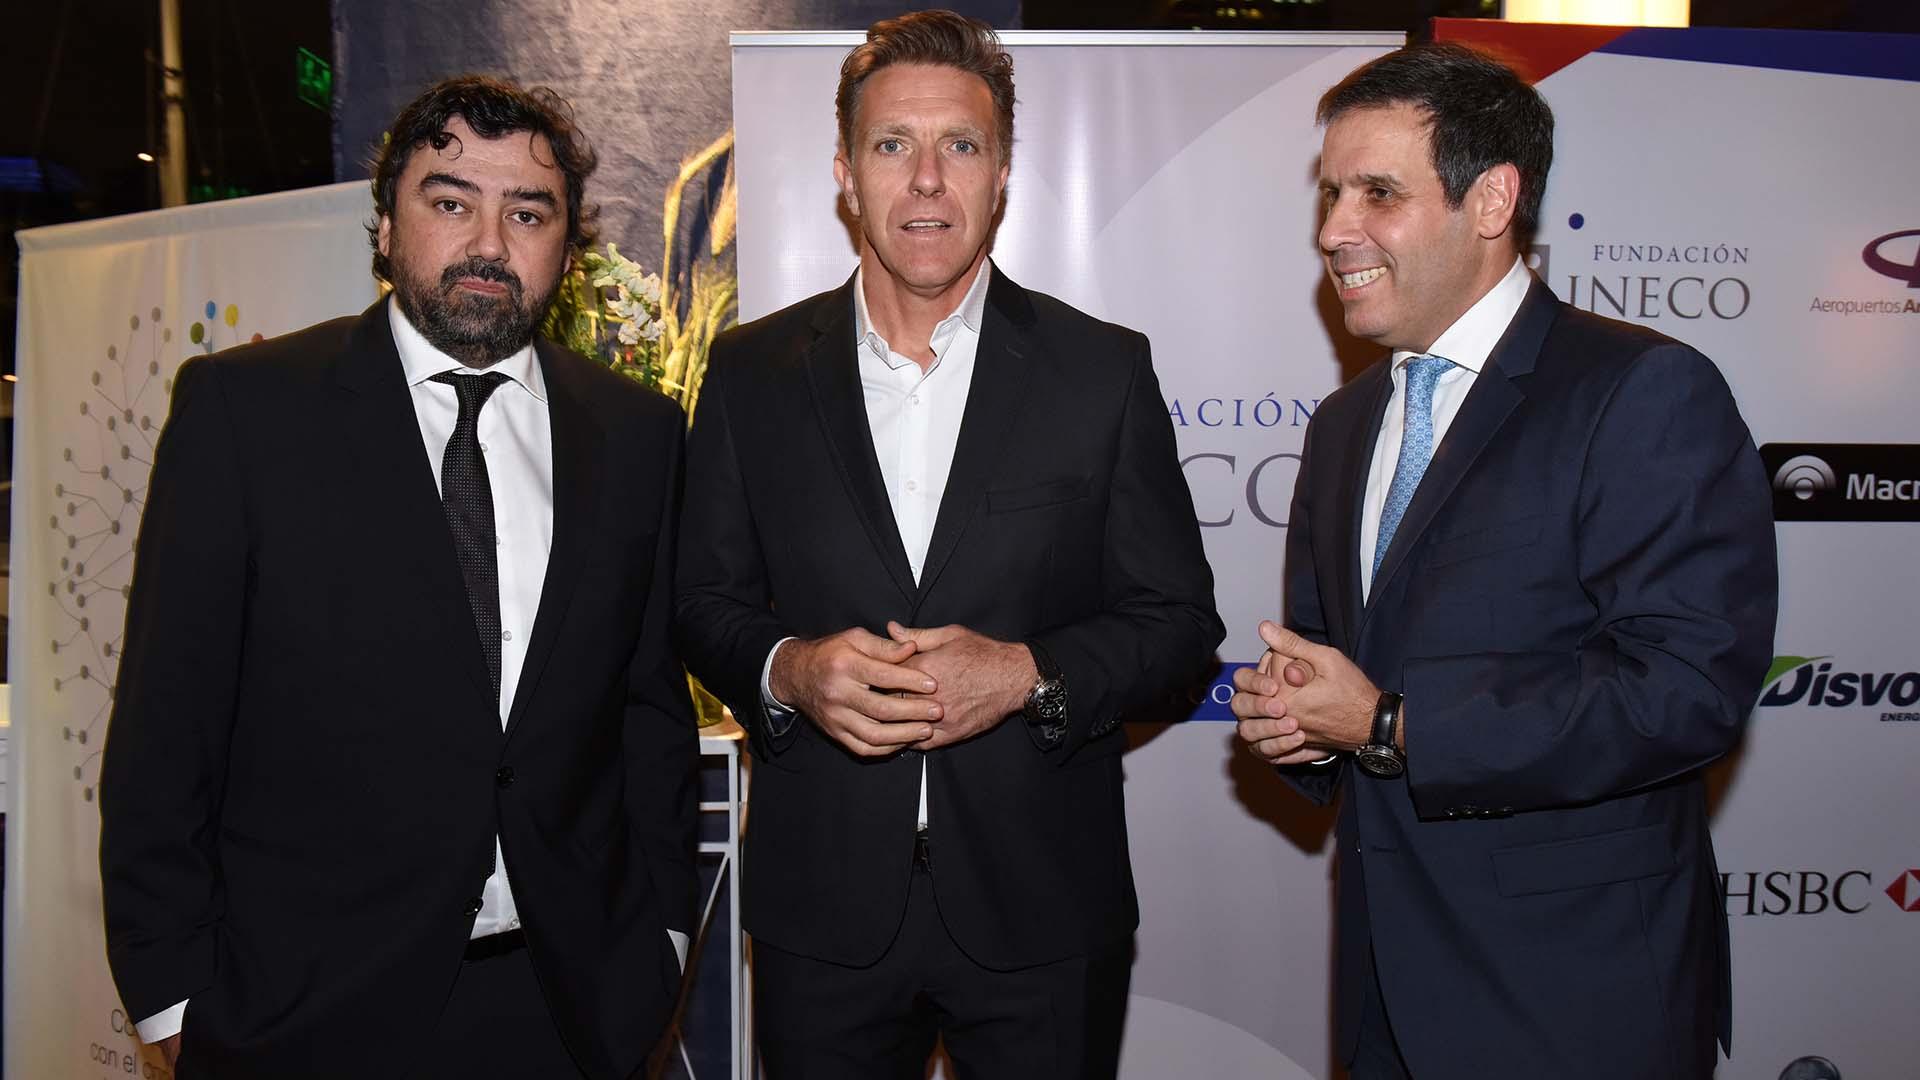 Juan Cruz Ávila, Alejandro Fantino y Gastón Manes